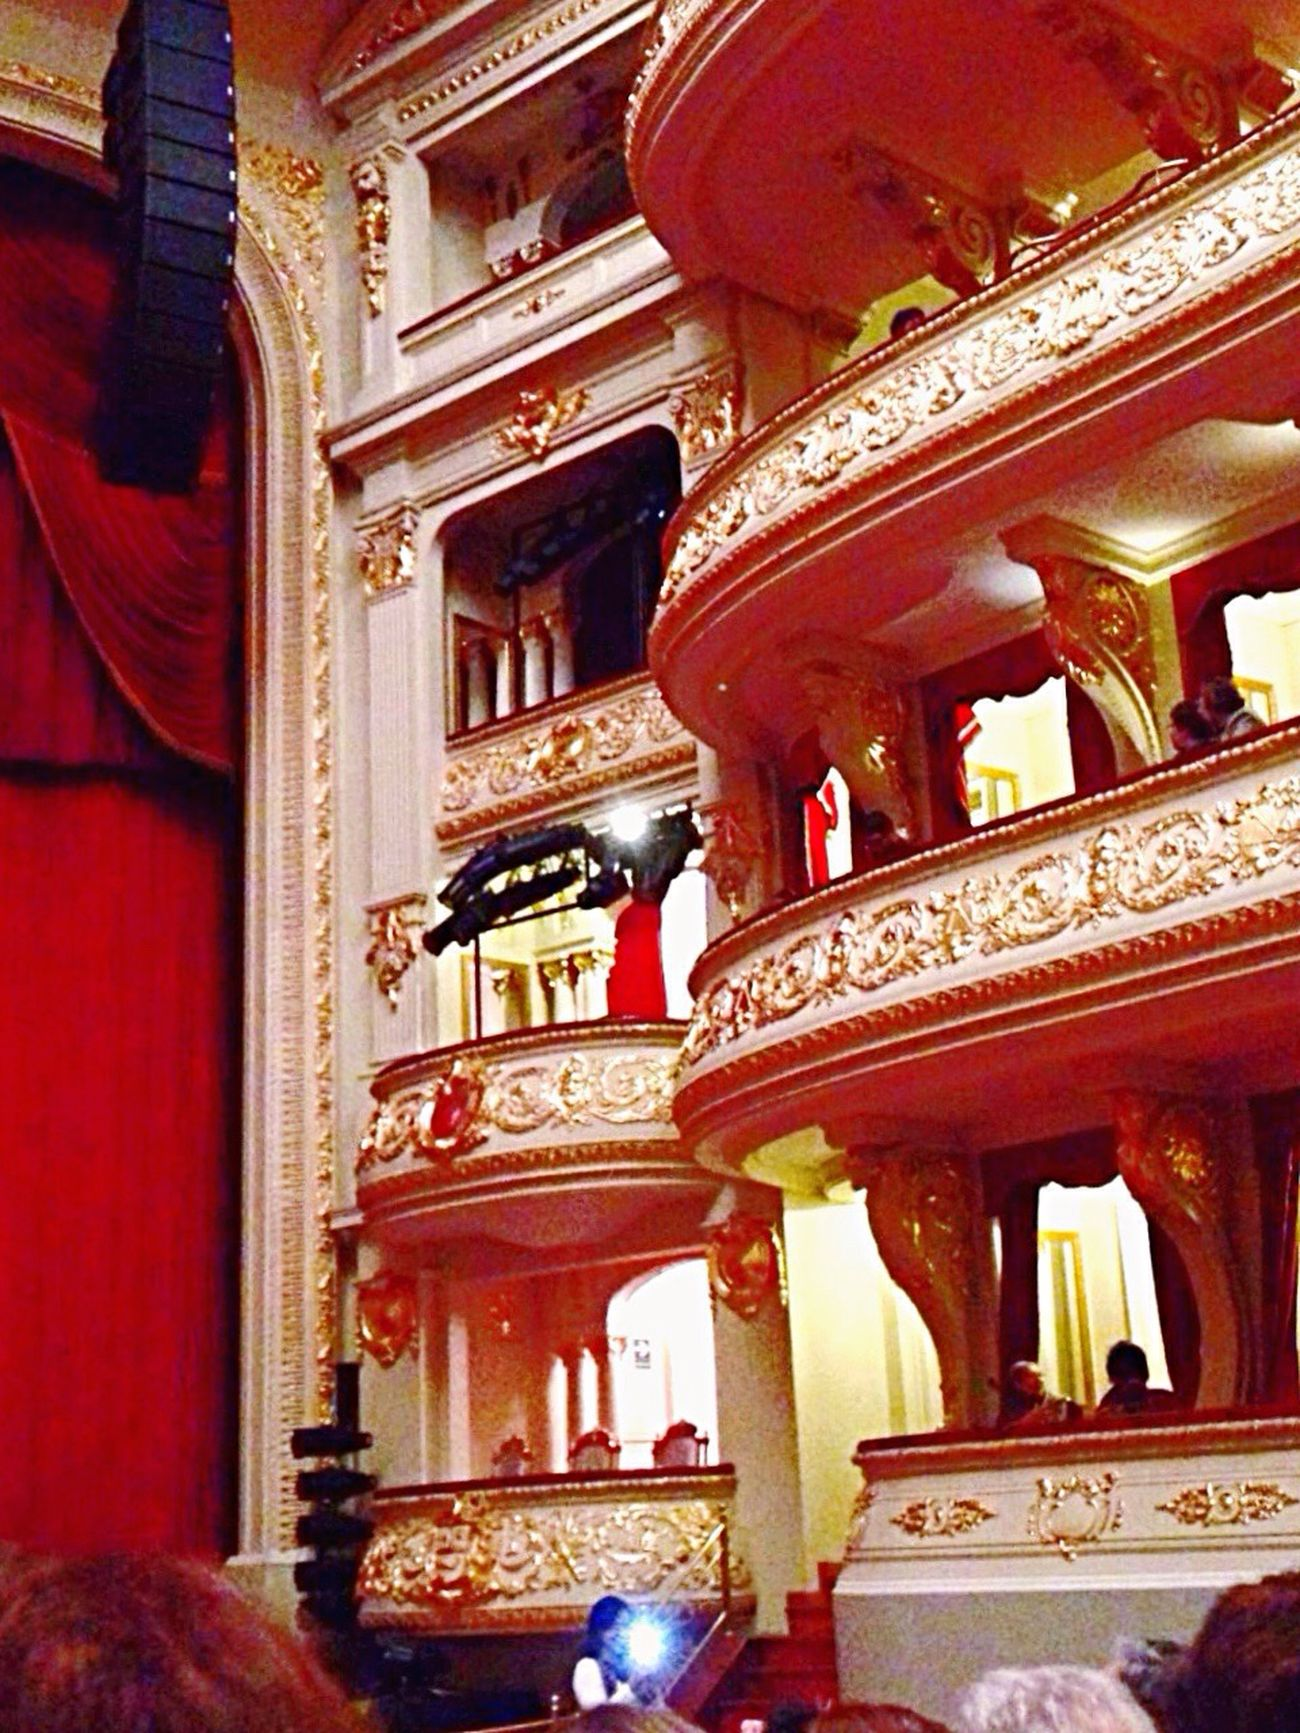 ❤️⚜ Beauty Gold Tone The Architect - 2016 EyeEm Awards Eye4photography  EyeEm Gallery Theater Art Detail Fantasy Fancy View From Below First Eyeem Photo Rosé Gold Beautiful Rococo Architecture Balcony